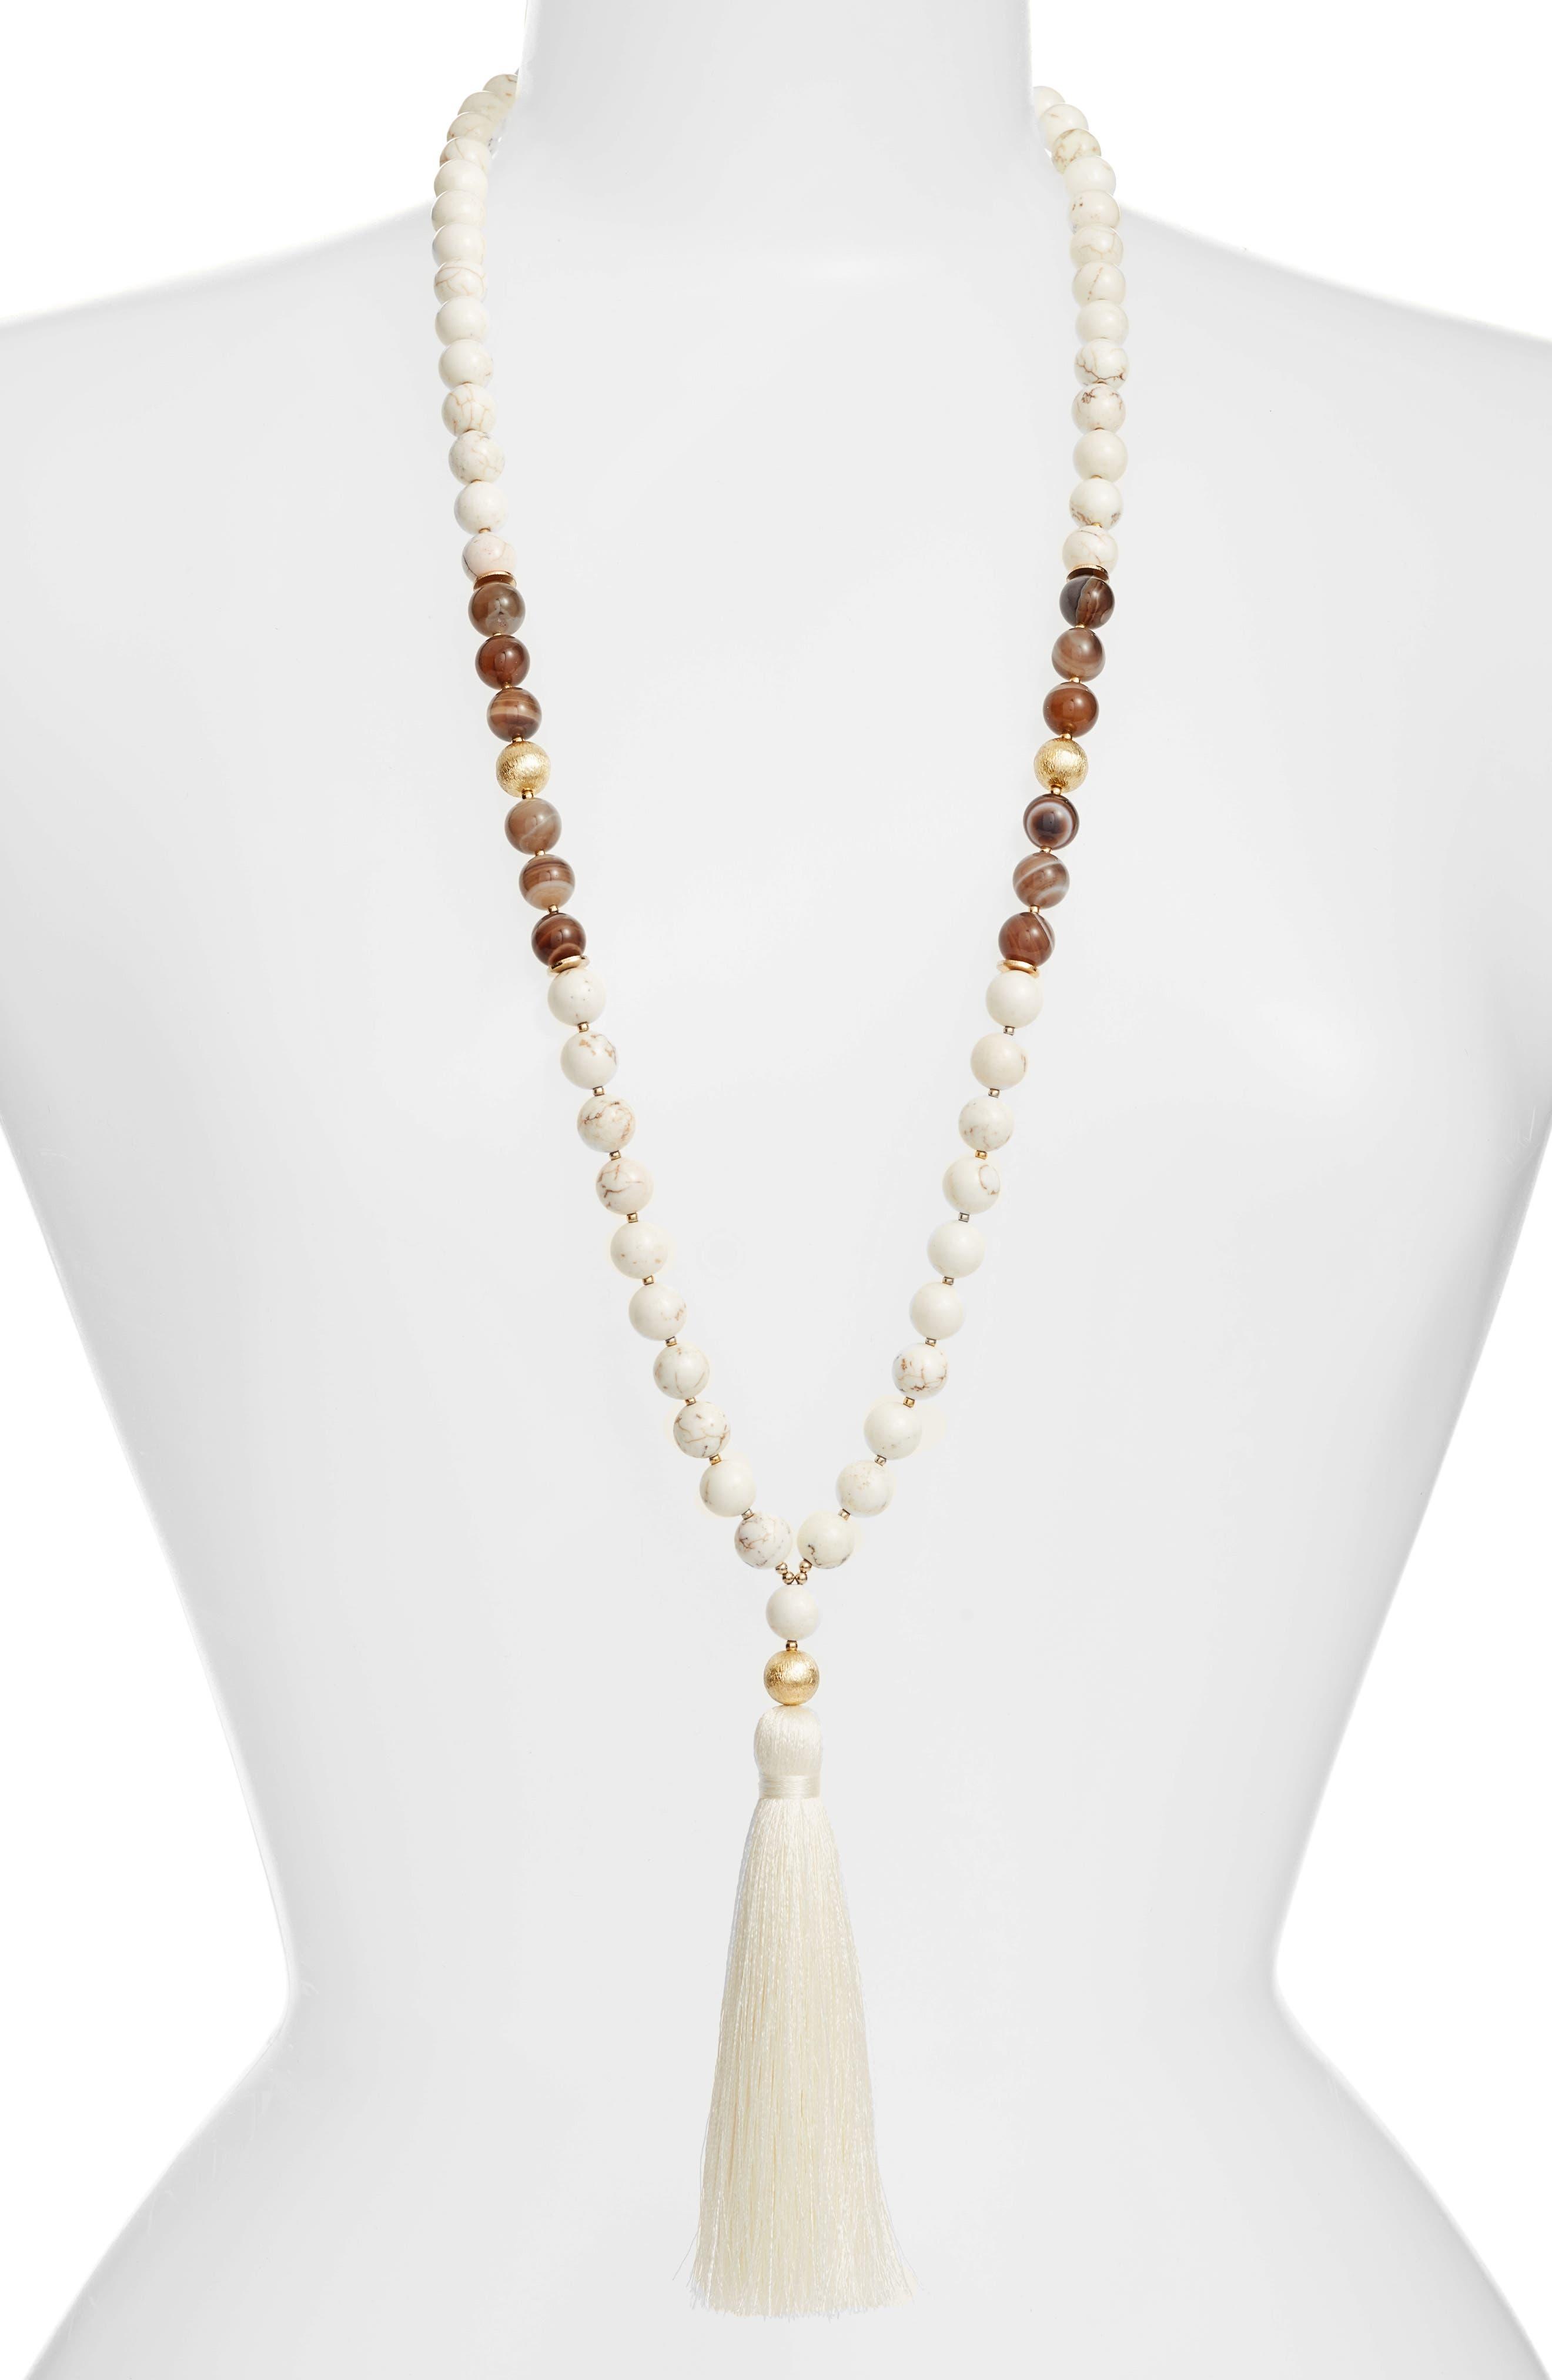 Alternate Image 1 Selected - Love's Affect Elle Semiprecious Stone Tassel Necklace